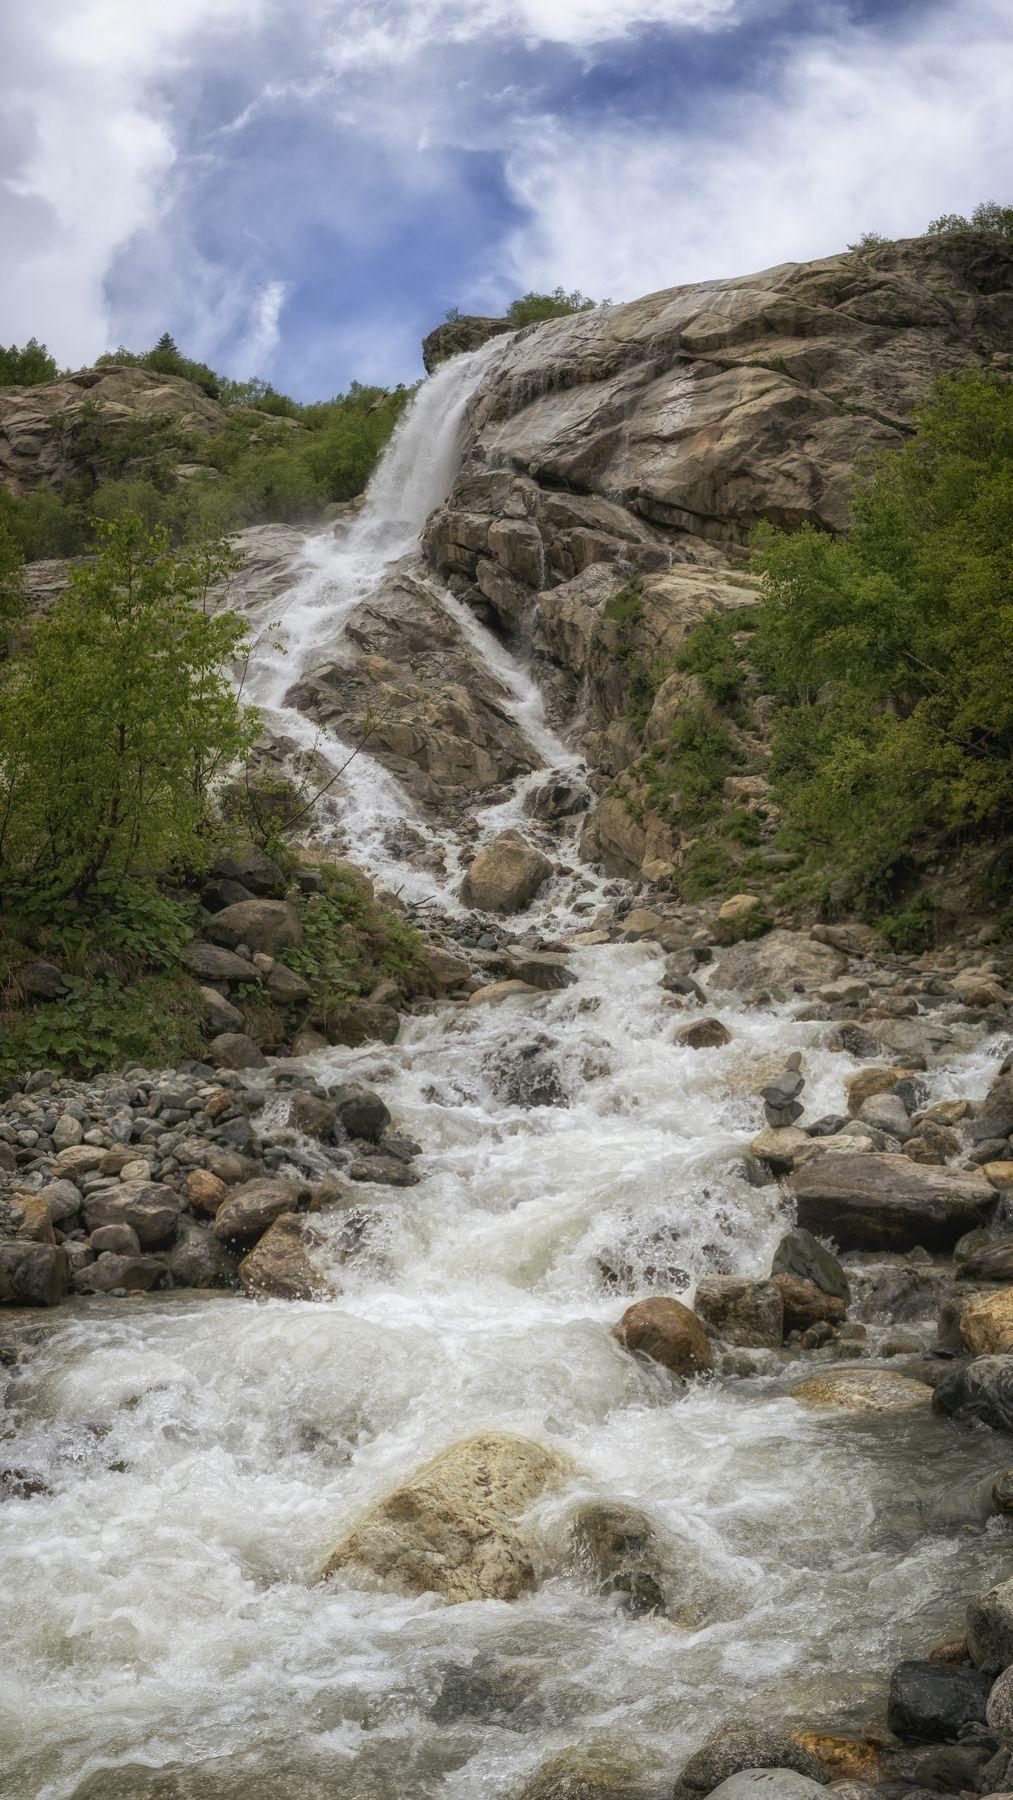 Алибекский водопад Россия Домбай горы облака панорама река водопад